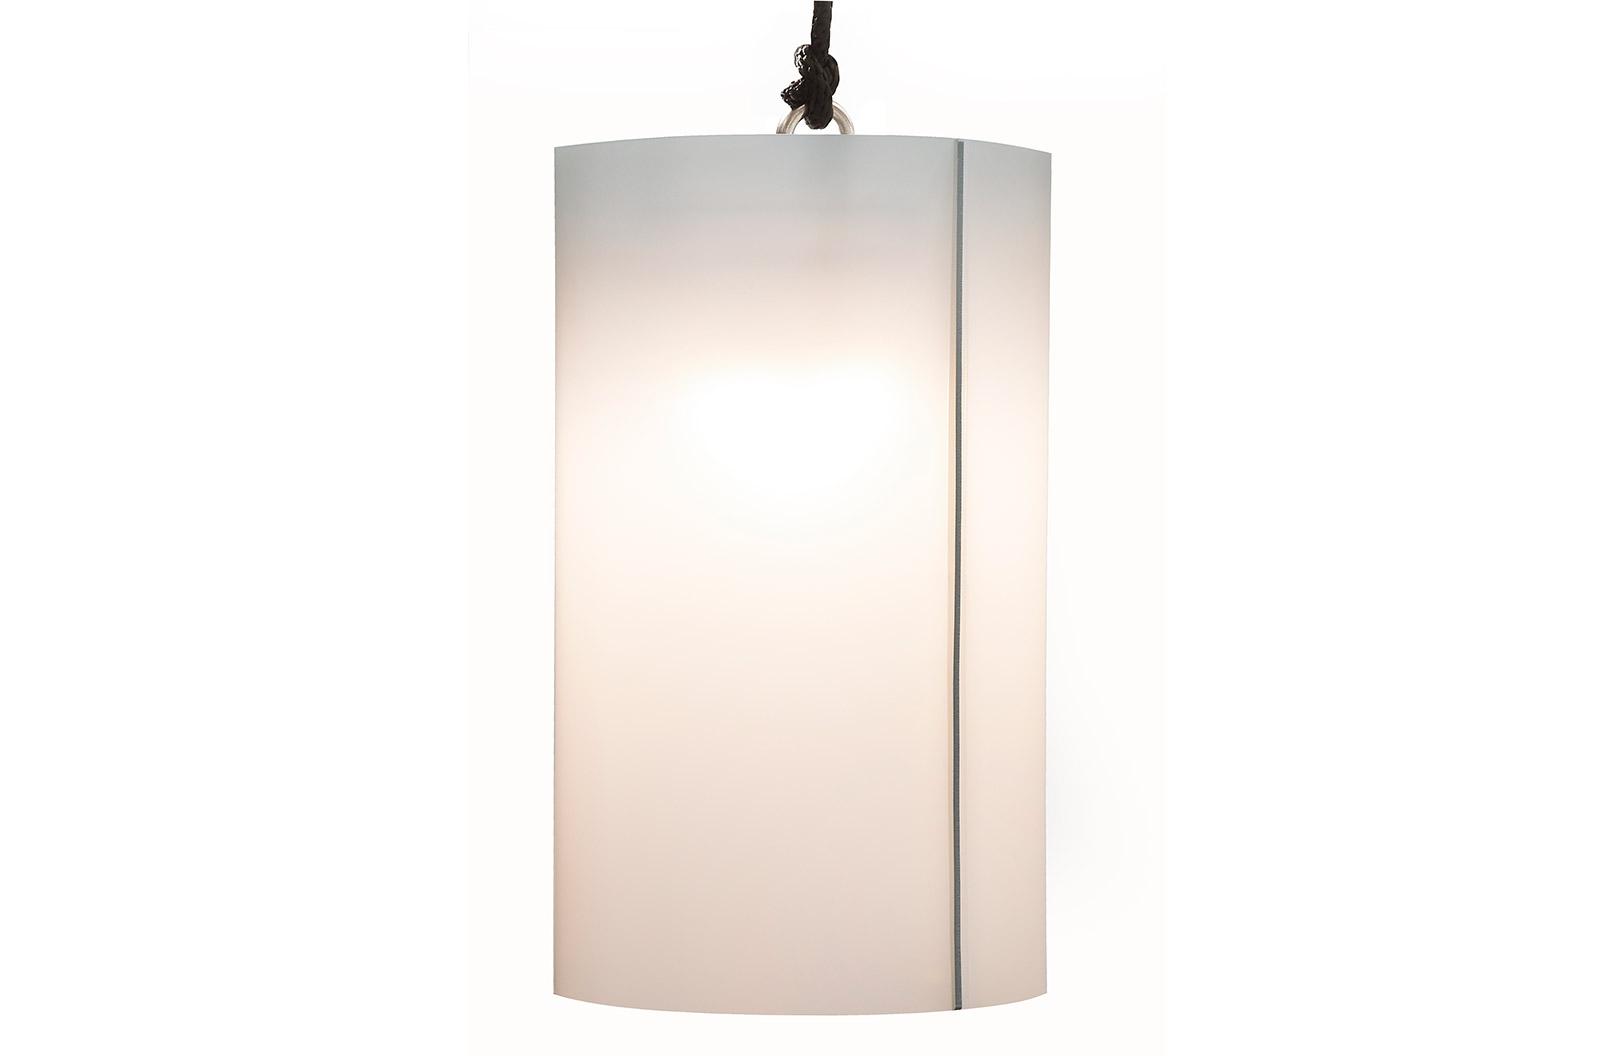 INDA Pendant Cordless LED Hanging Lamp/Shade - Seasonal Living